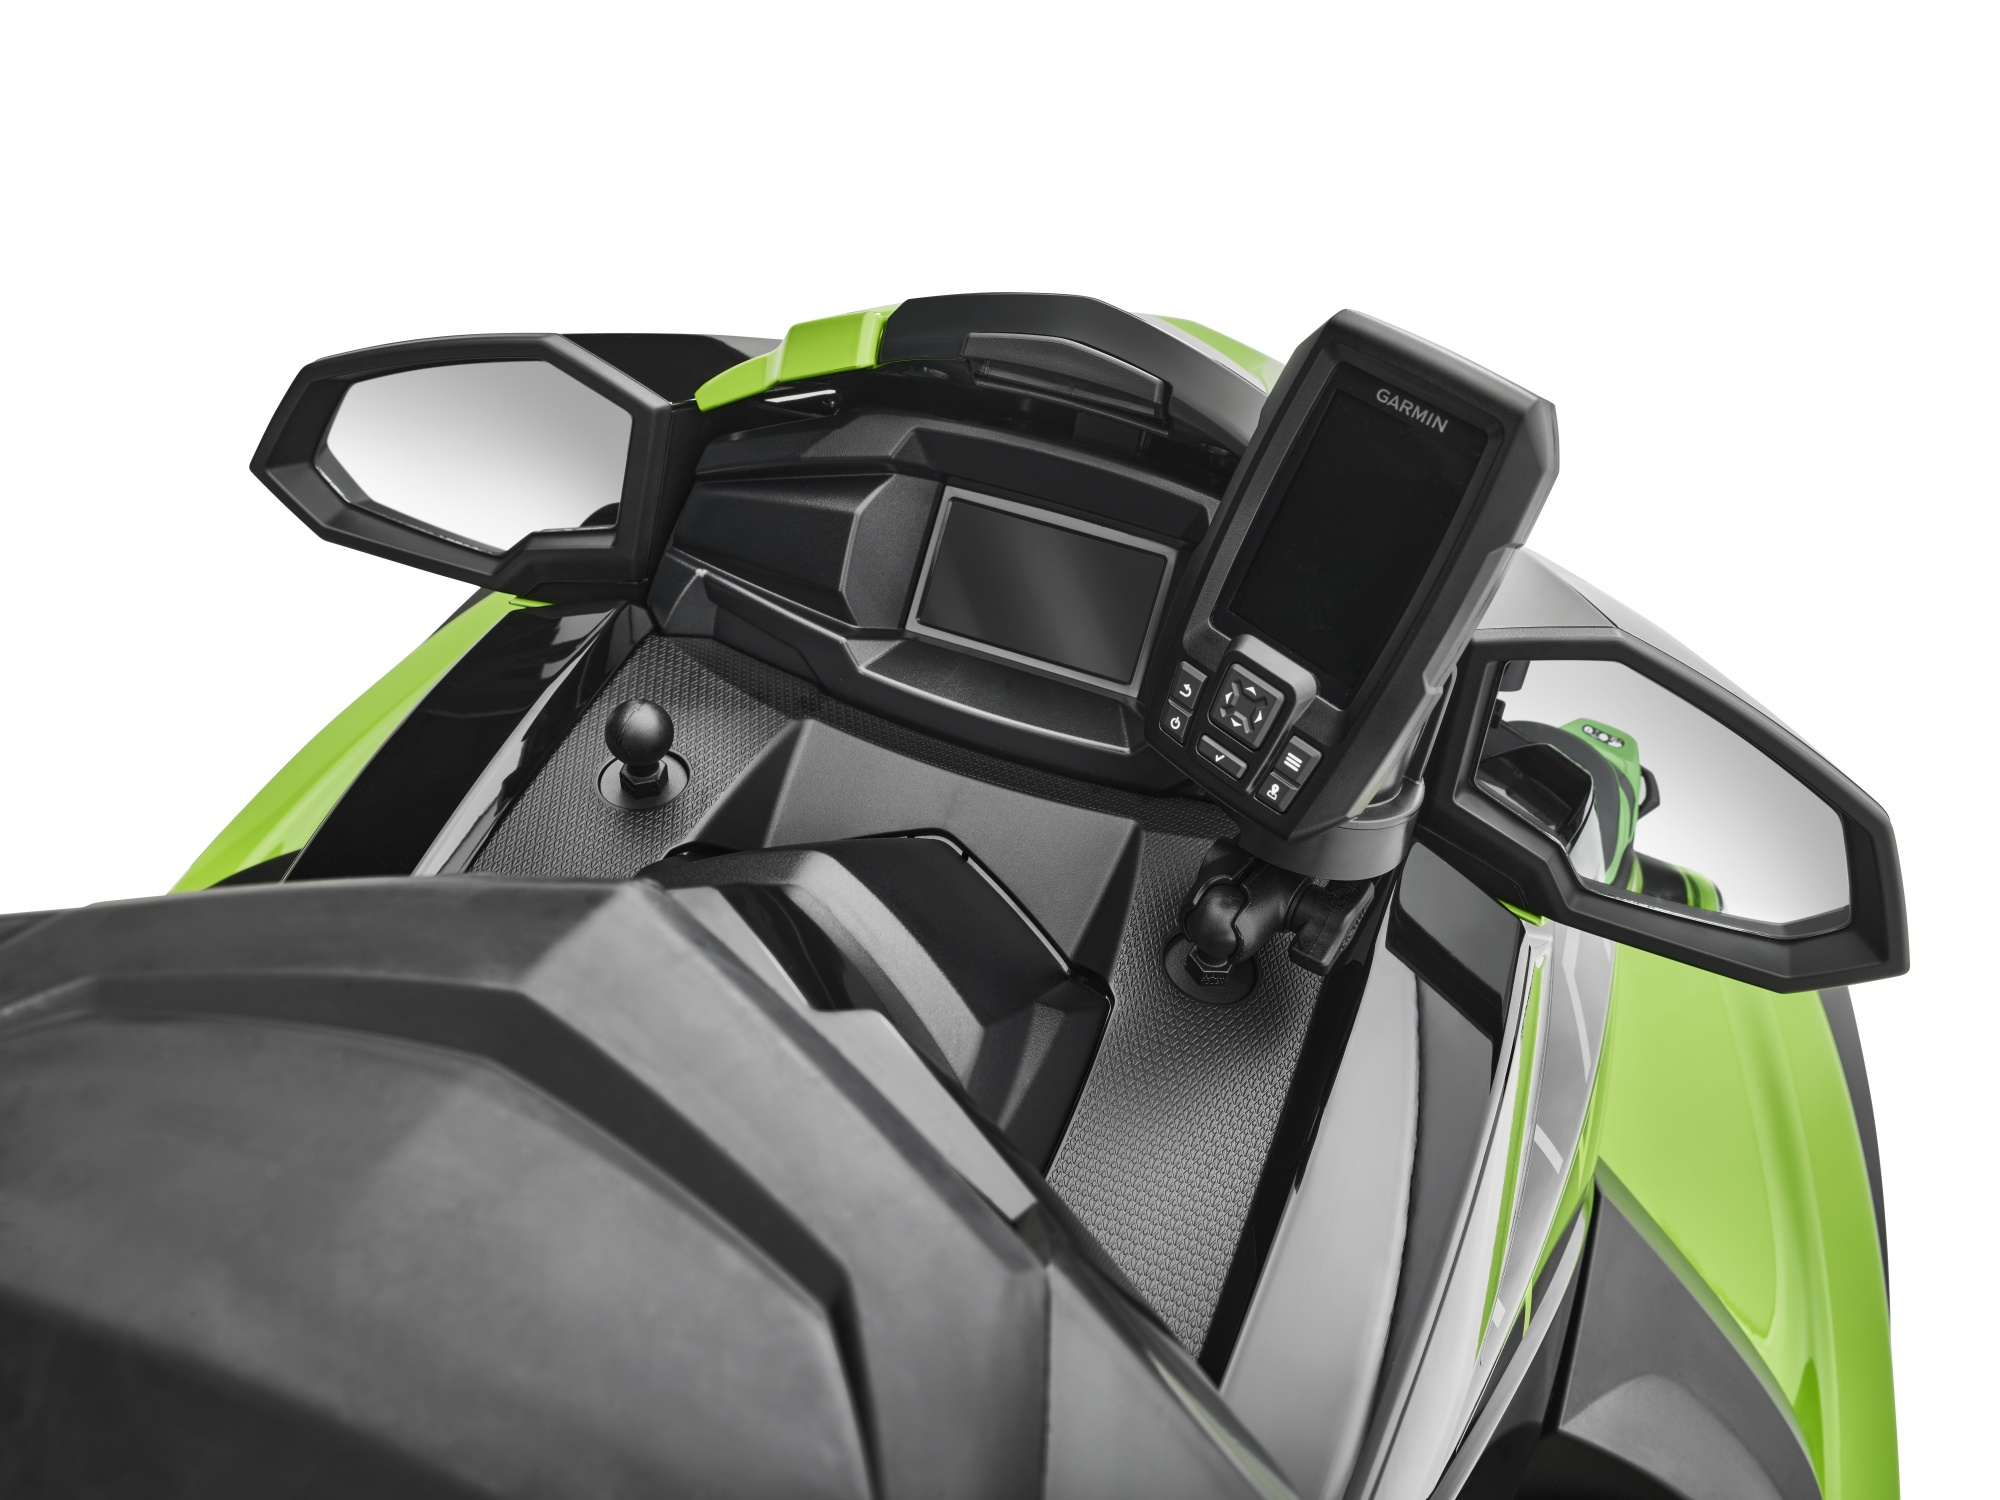 Yamaha VX CRUISER HO - 2021_VXCruiserHO_Detail_Multimount